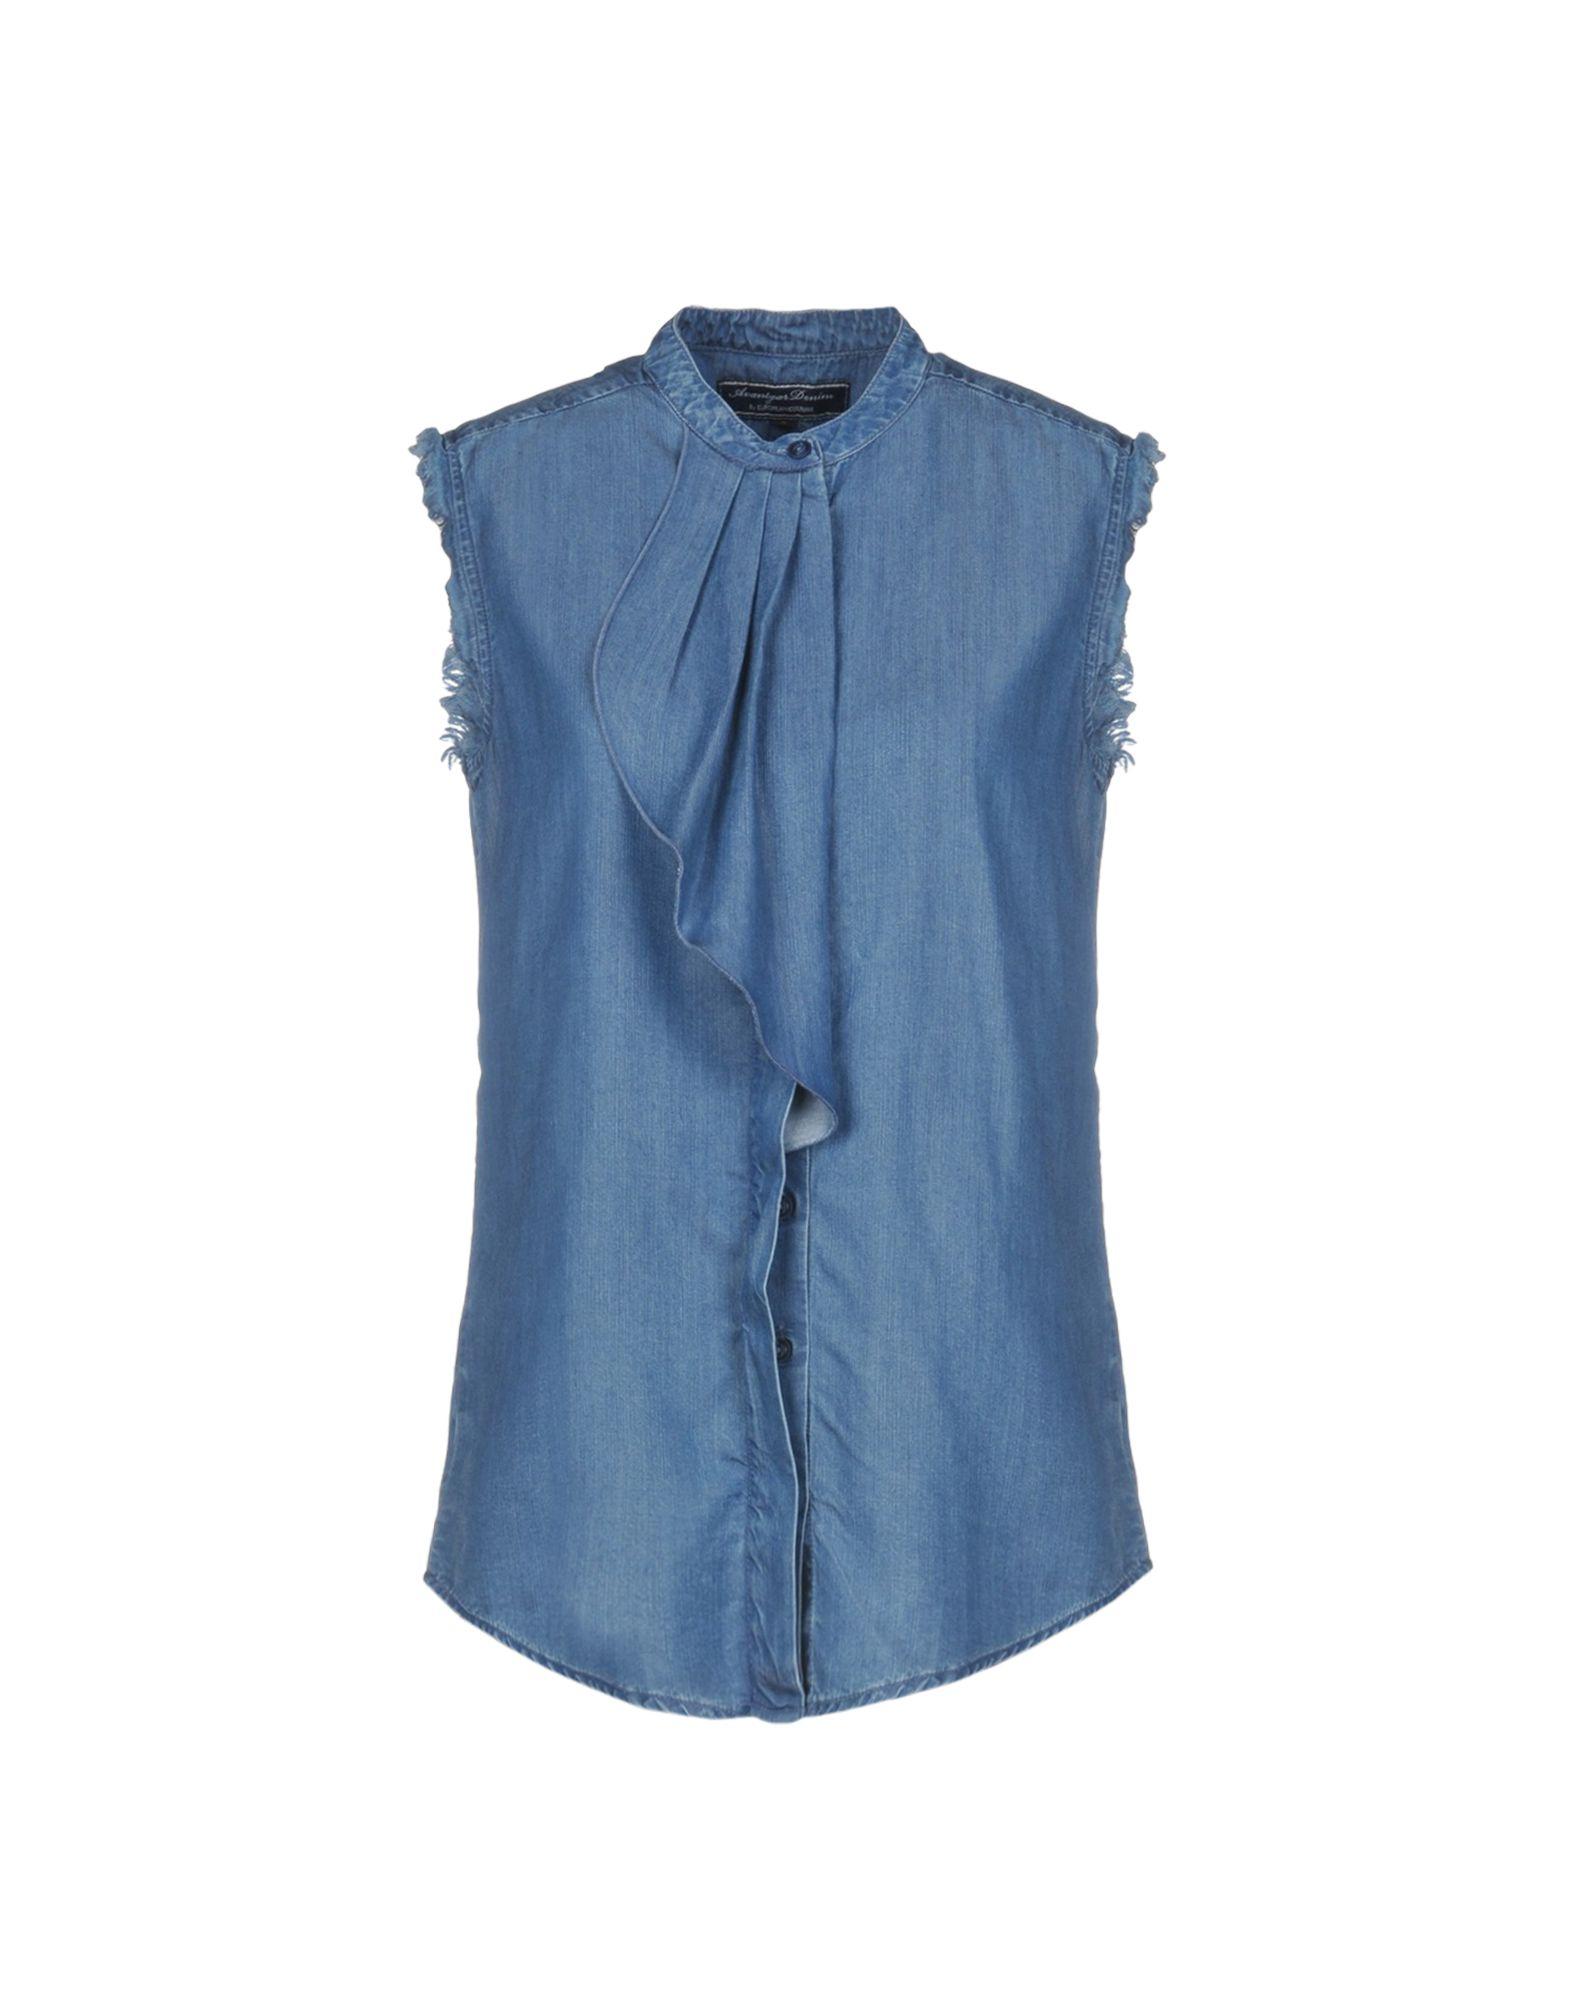 AVANTGAR DENIM by EUROPEAN CULTURE Джинсовая рубашка женская рубашка european and american big c002617 2015